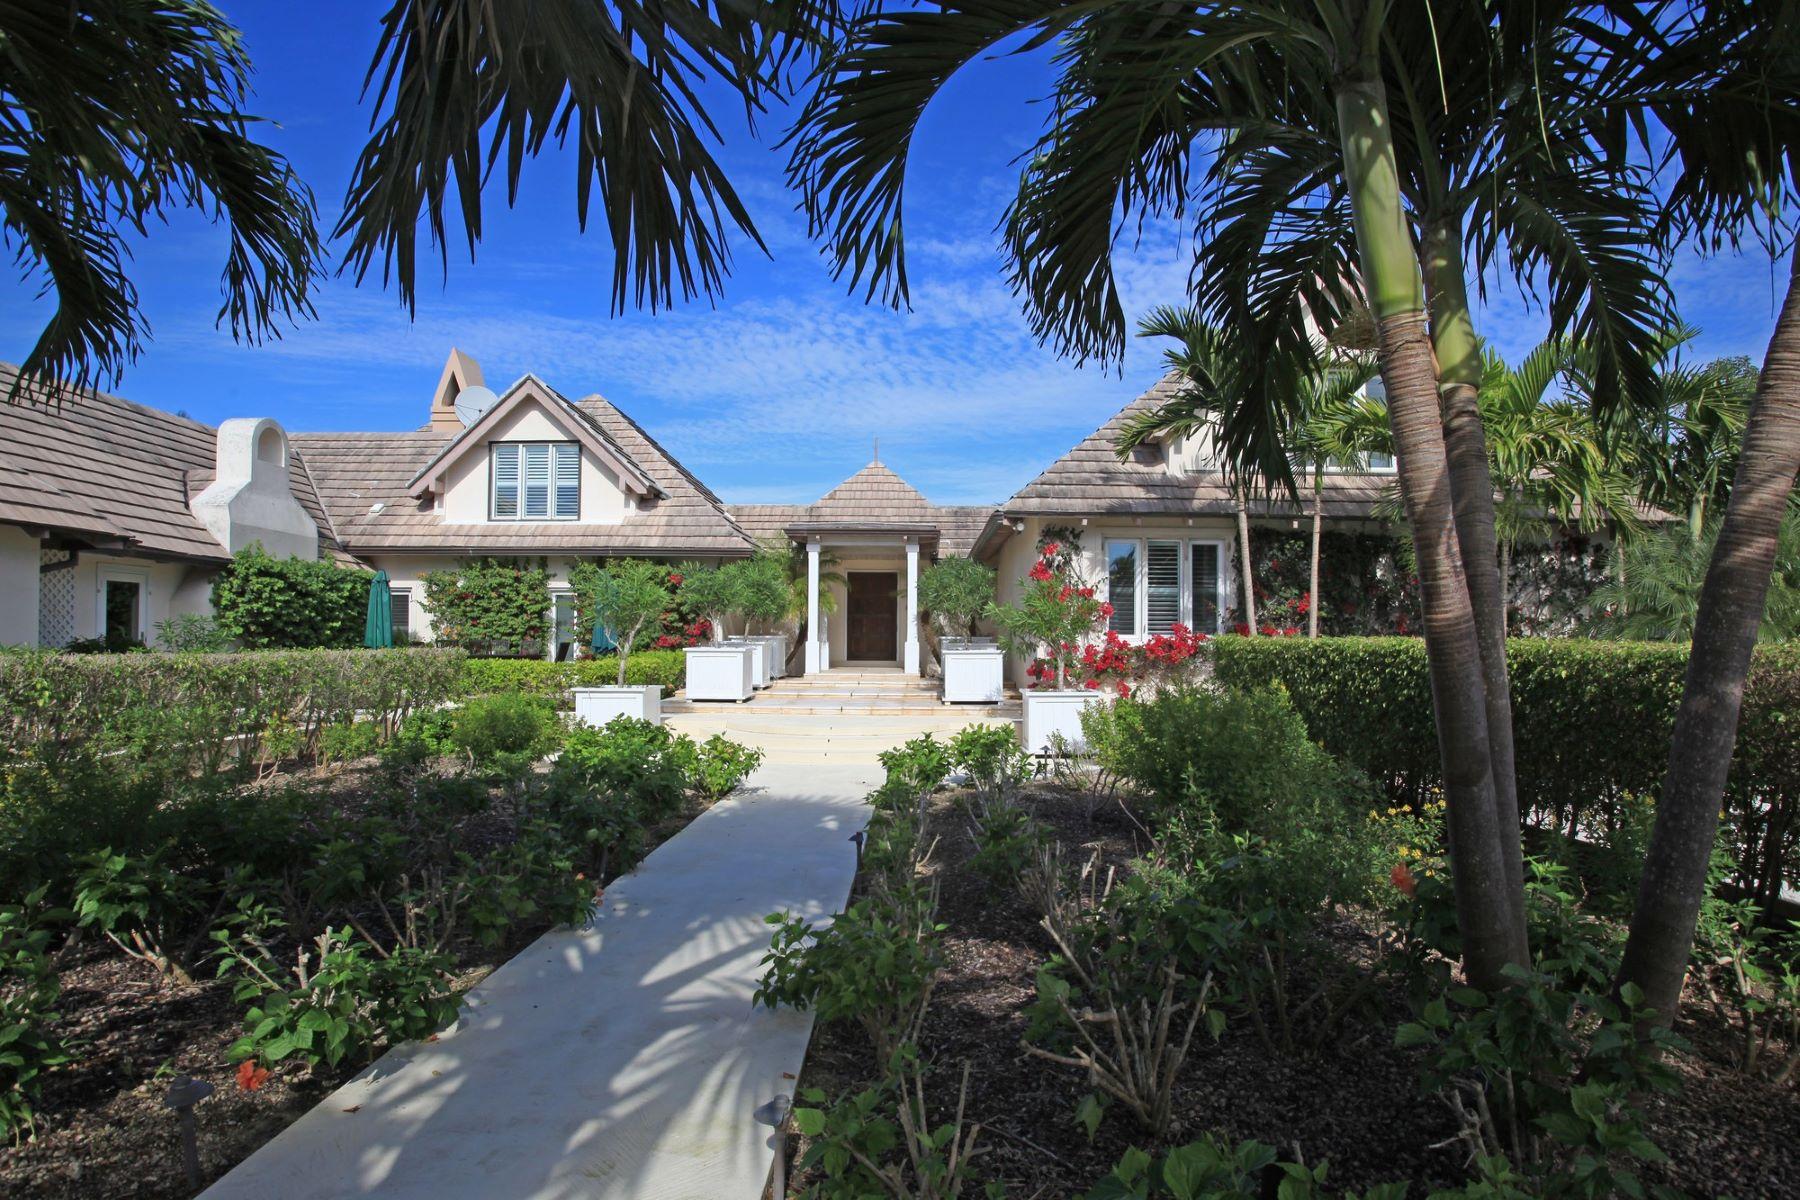 Vacation Rentals للـ Rent في Lagoon Beach House Other Bahamas, Other Areas In The Bahamas, Bahamas